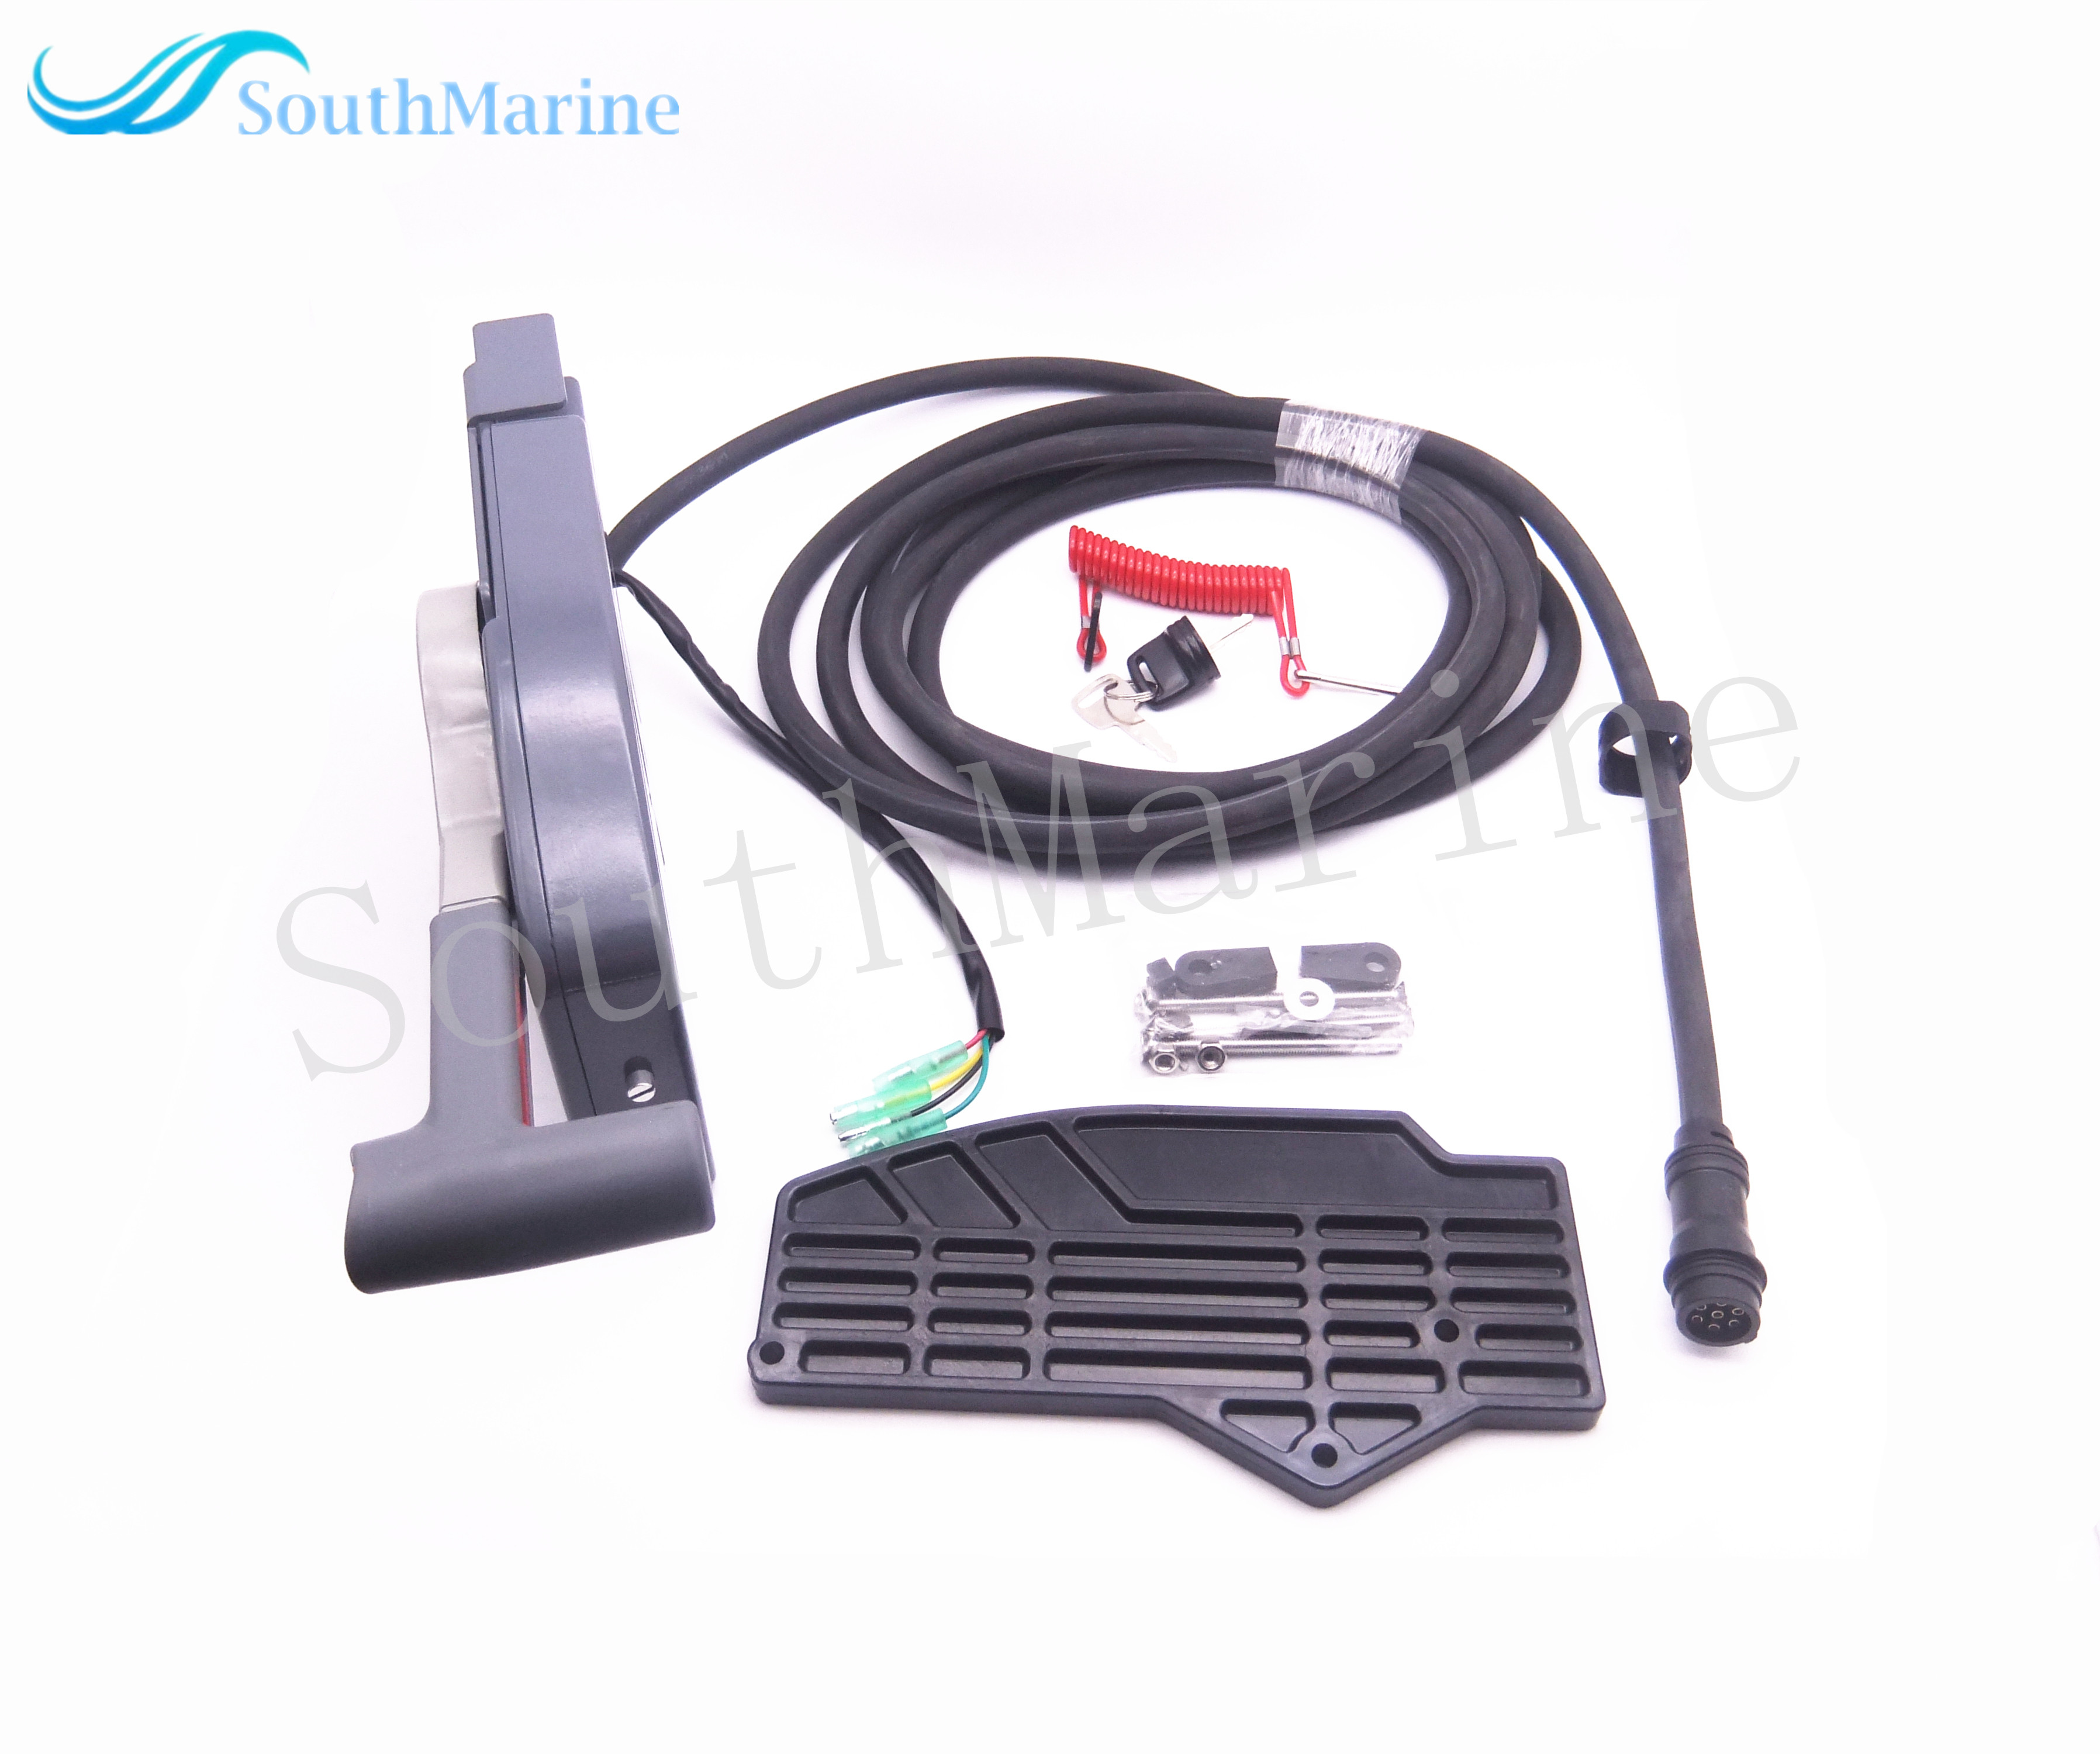 Boat Motor 703 48230 14 703 48203 15 703 48203 17 Remote